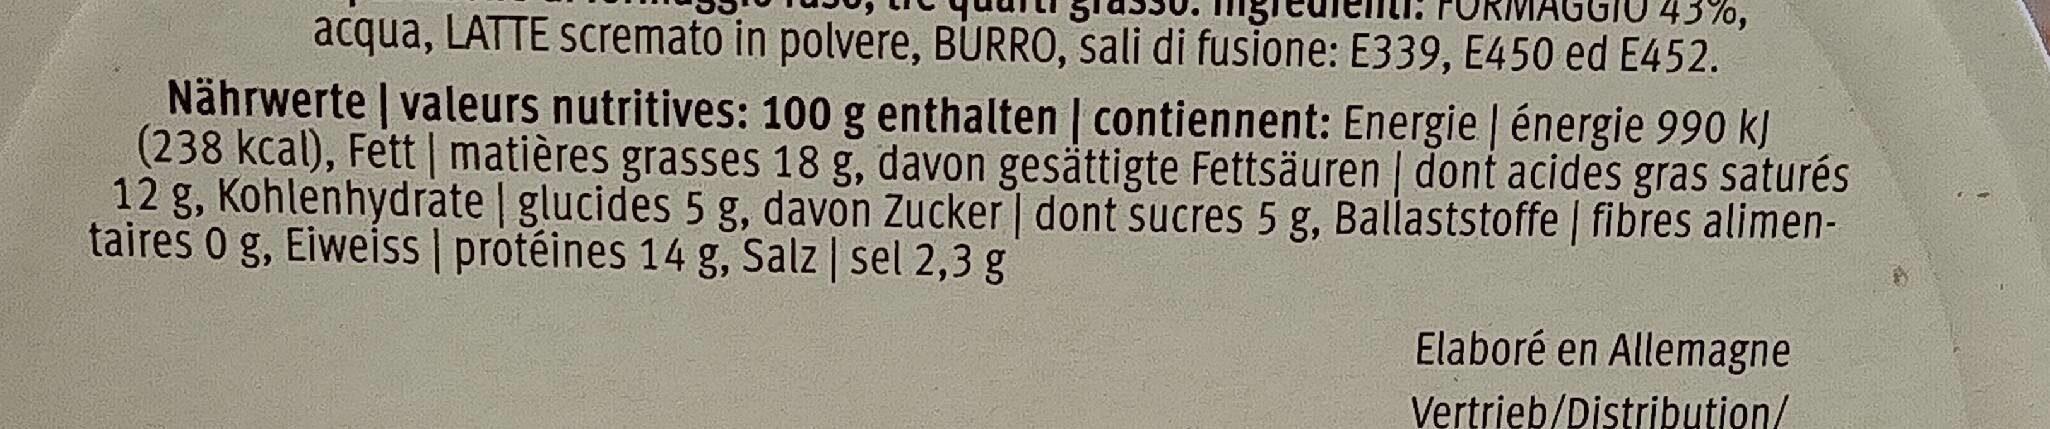 Préparation de fromage fondu - Nährwertangaben - fr